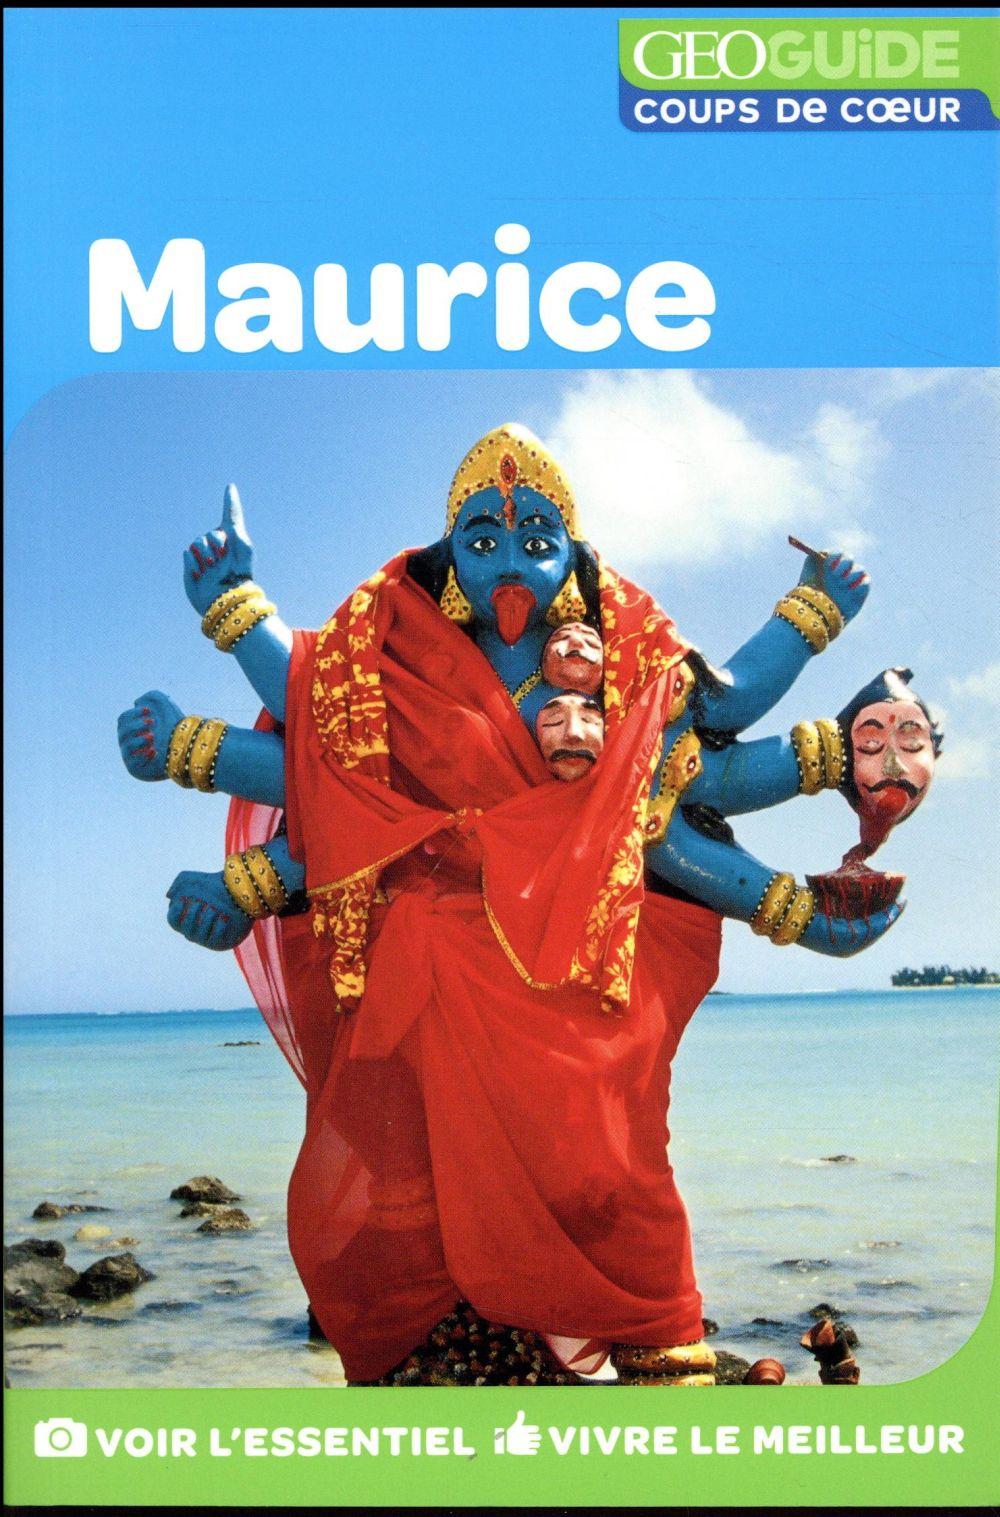 GEOguide coups de coeur ; Maurice